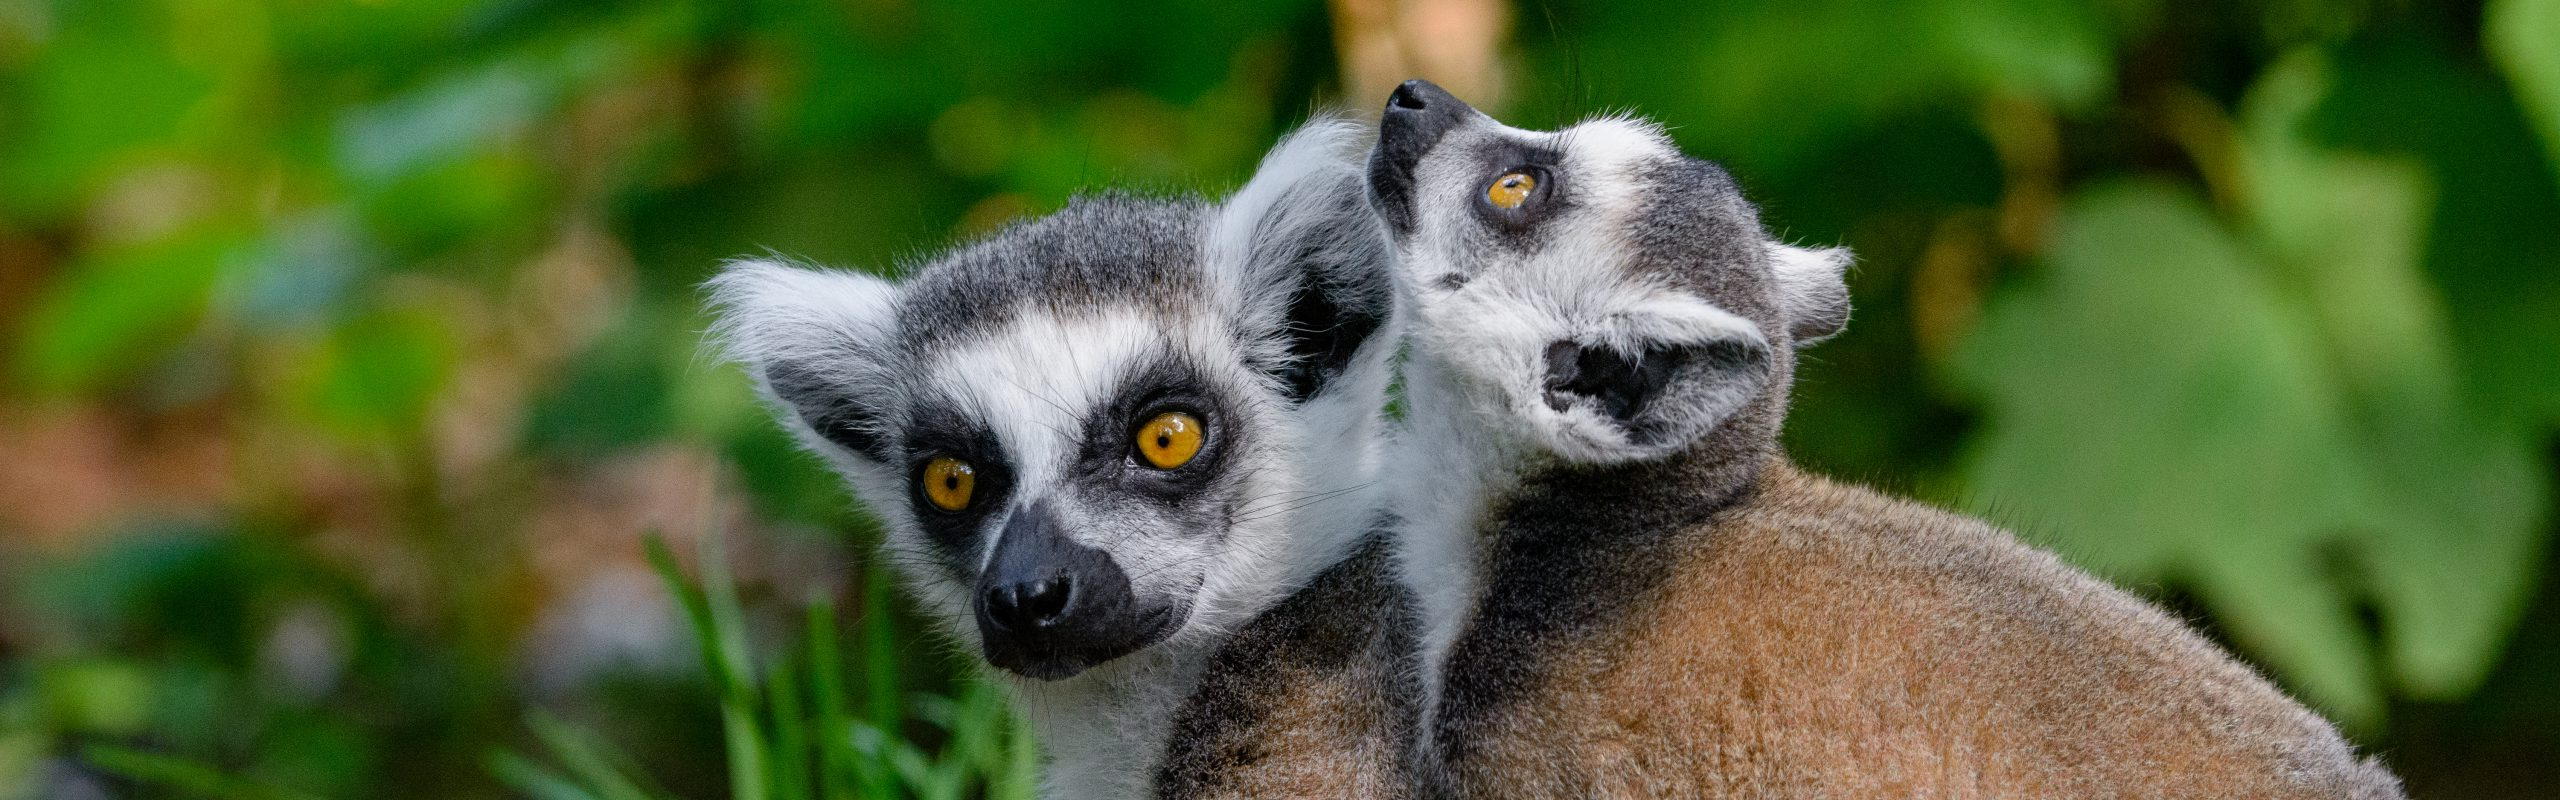 https://faunafocus.com/home/november-2018-ring-tailed-lemur/#jp-carousel-11928